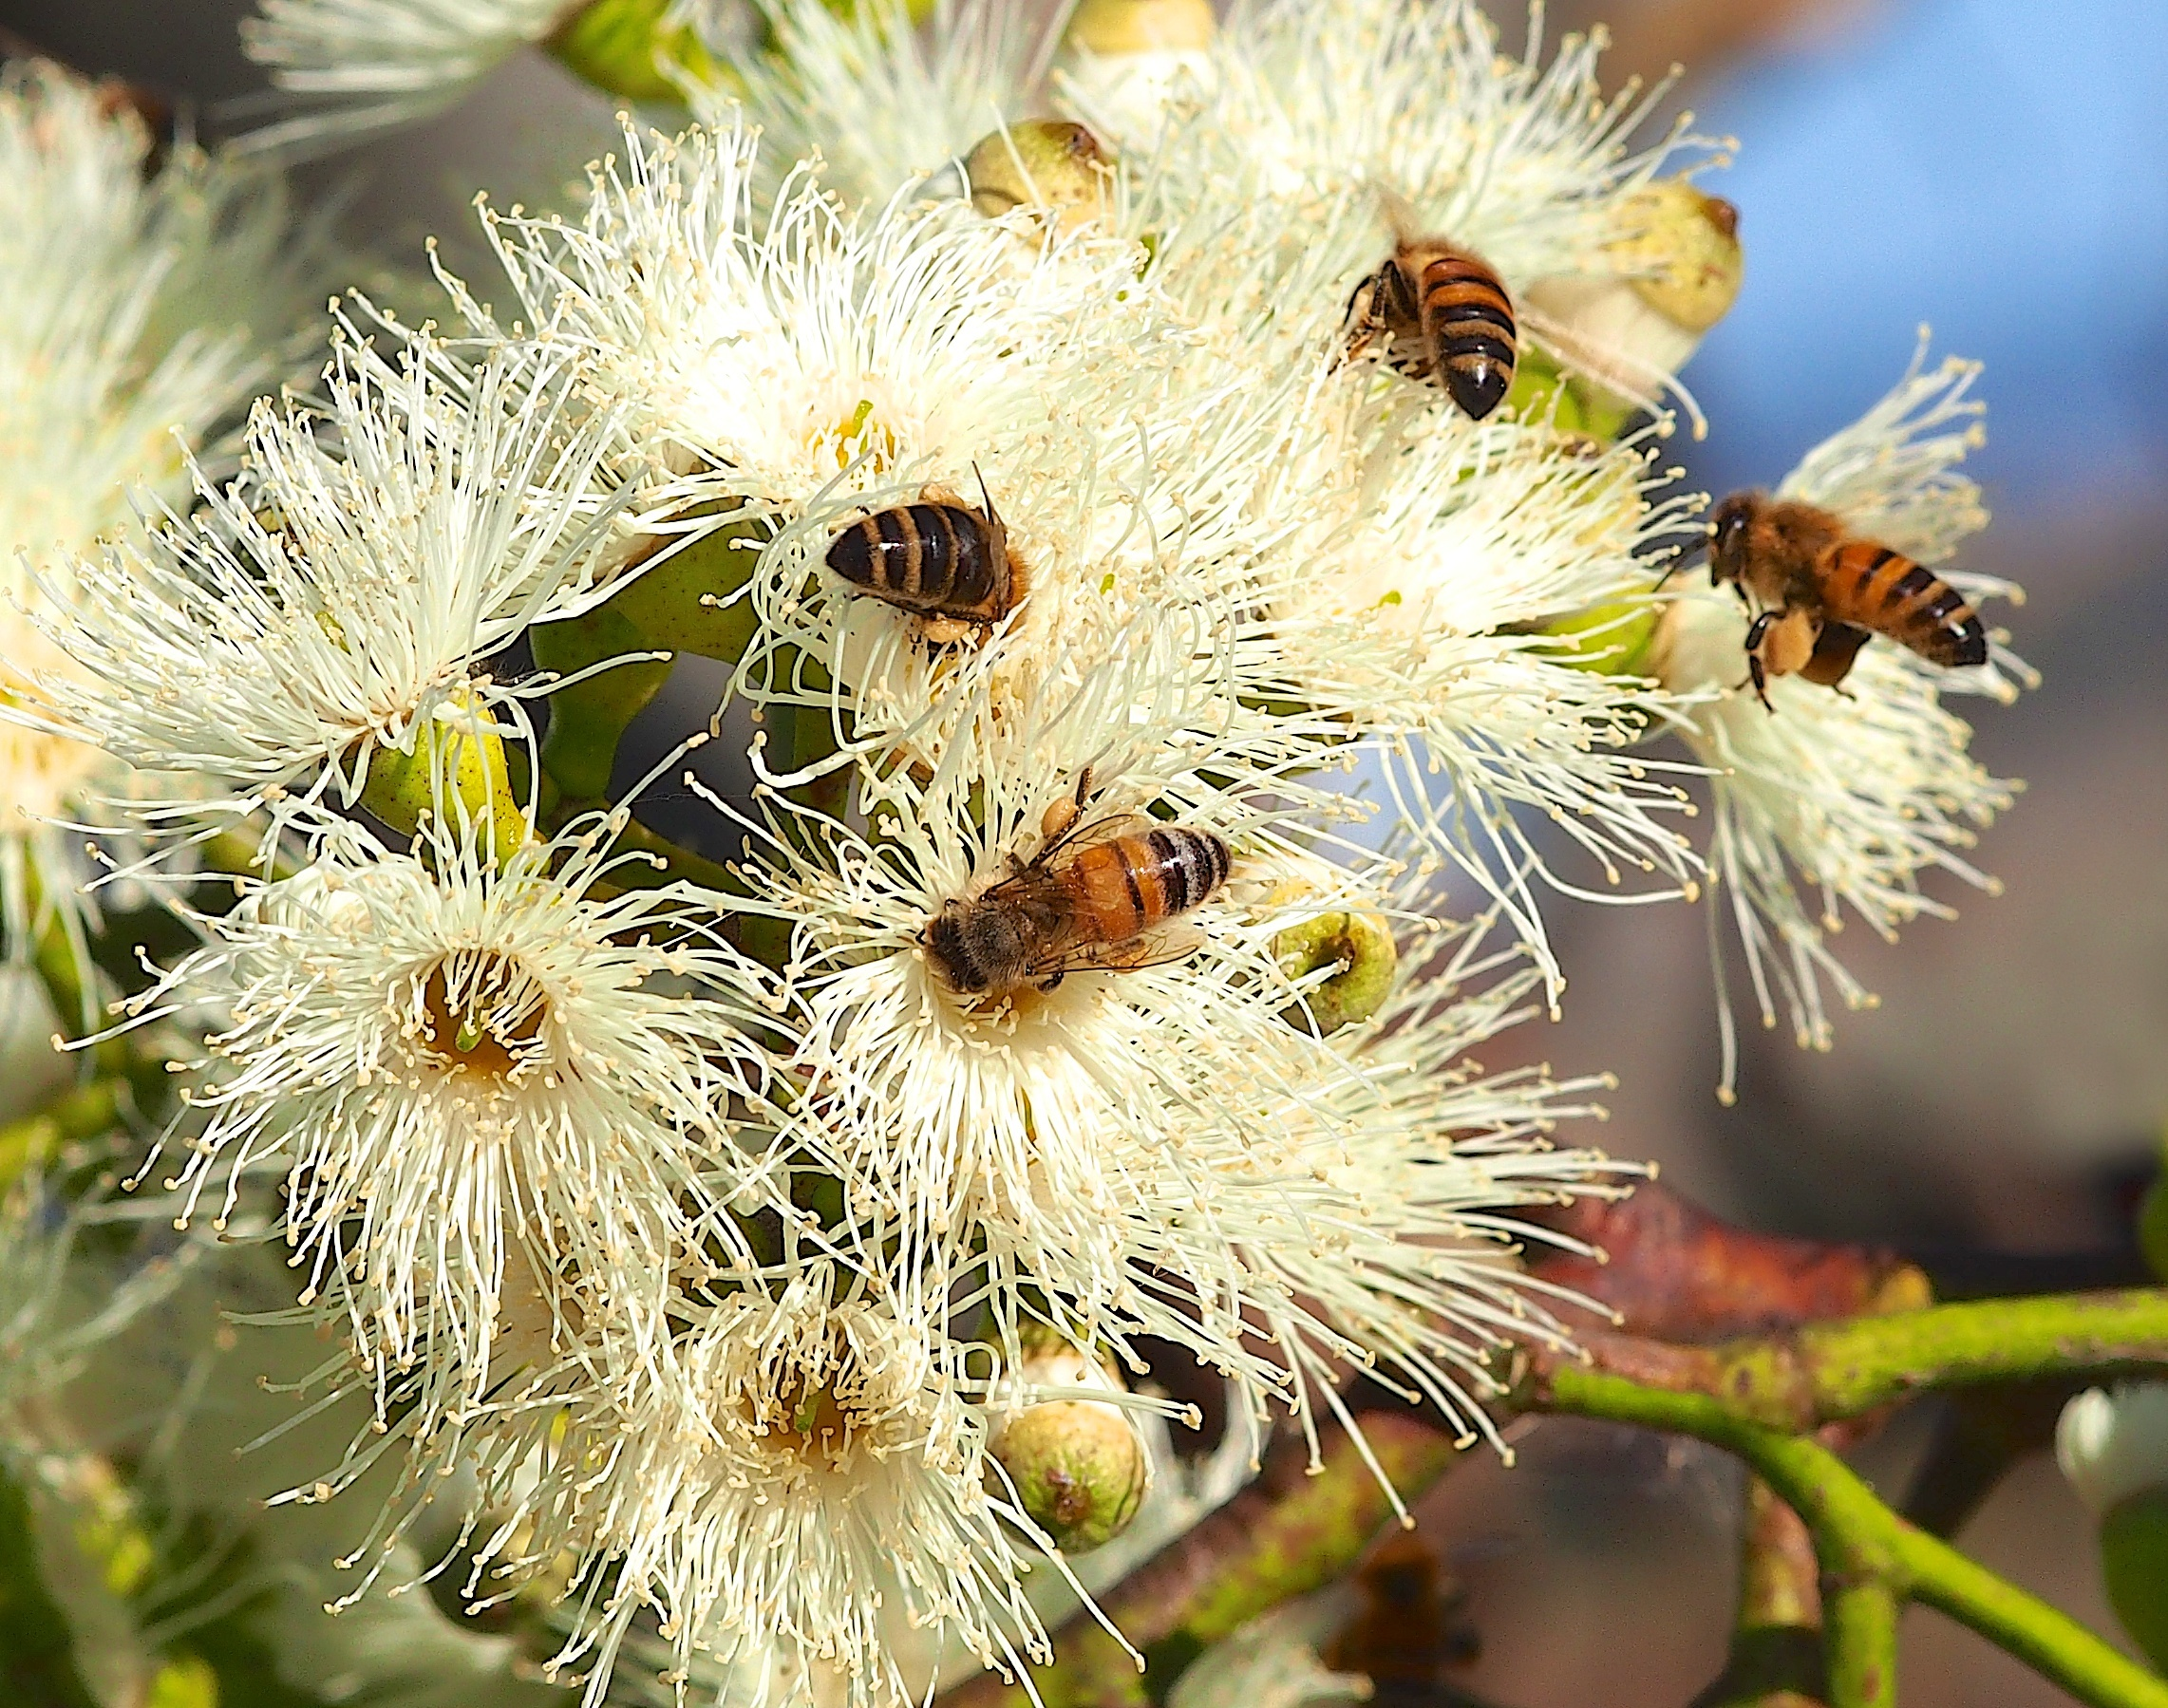 Honey Bees Collecting Eucalyptus Nectar From The Sugar Gum Tree (Eucalyptus Cladocalyx)